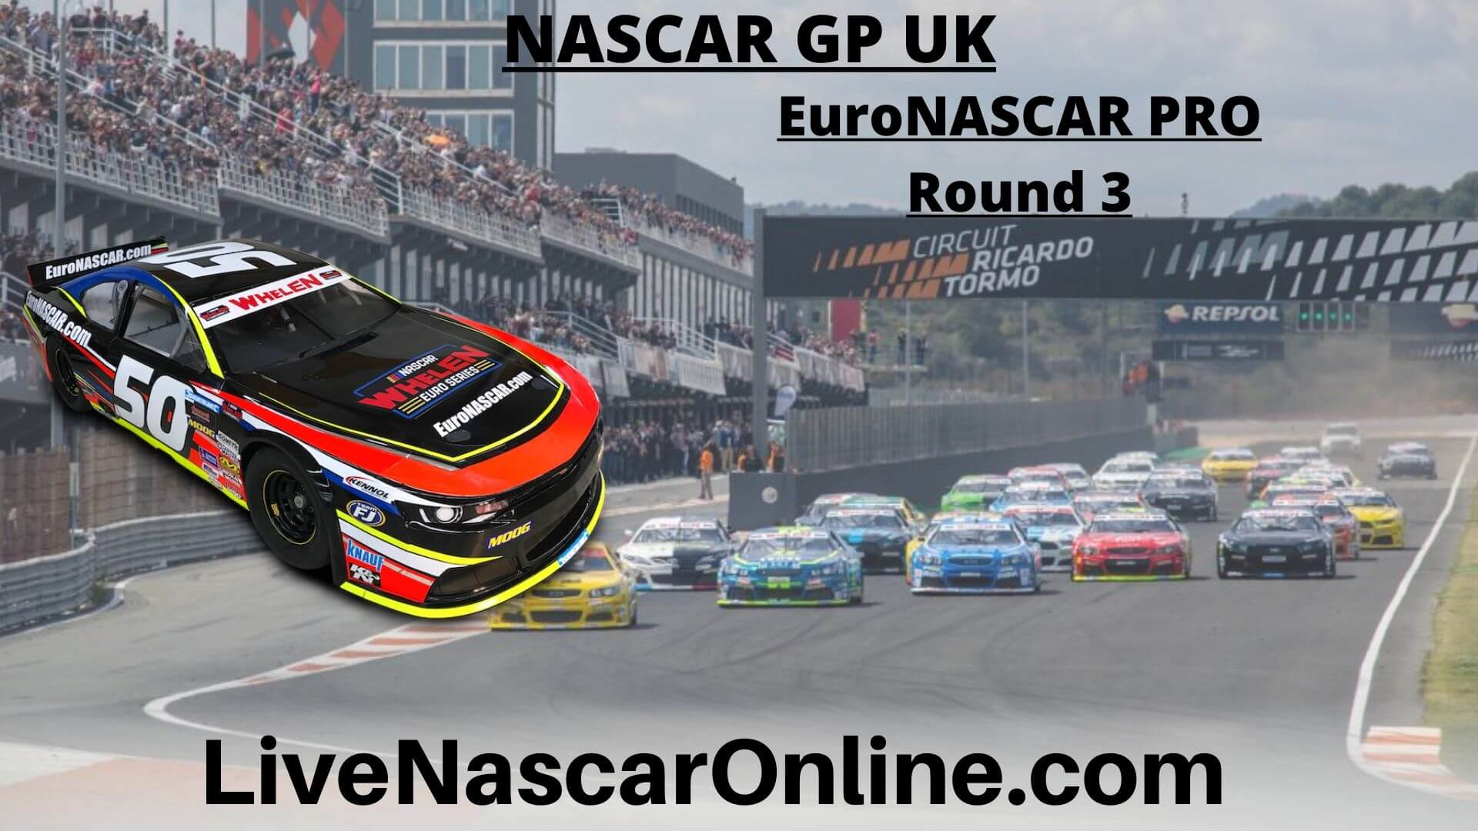 NASCAR GP UK Online Stream | Euro NASCAR PRO Round 3